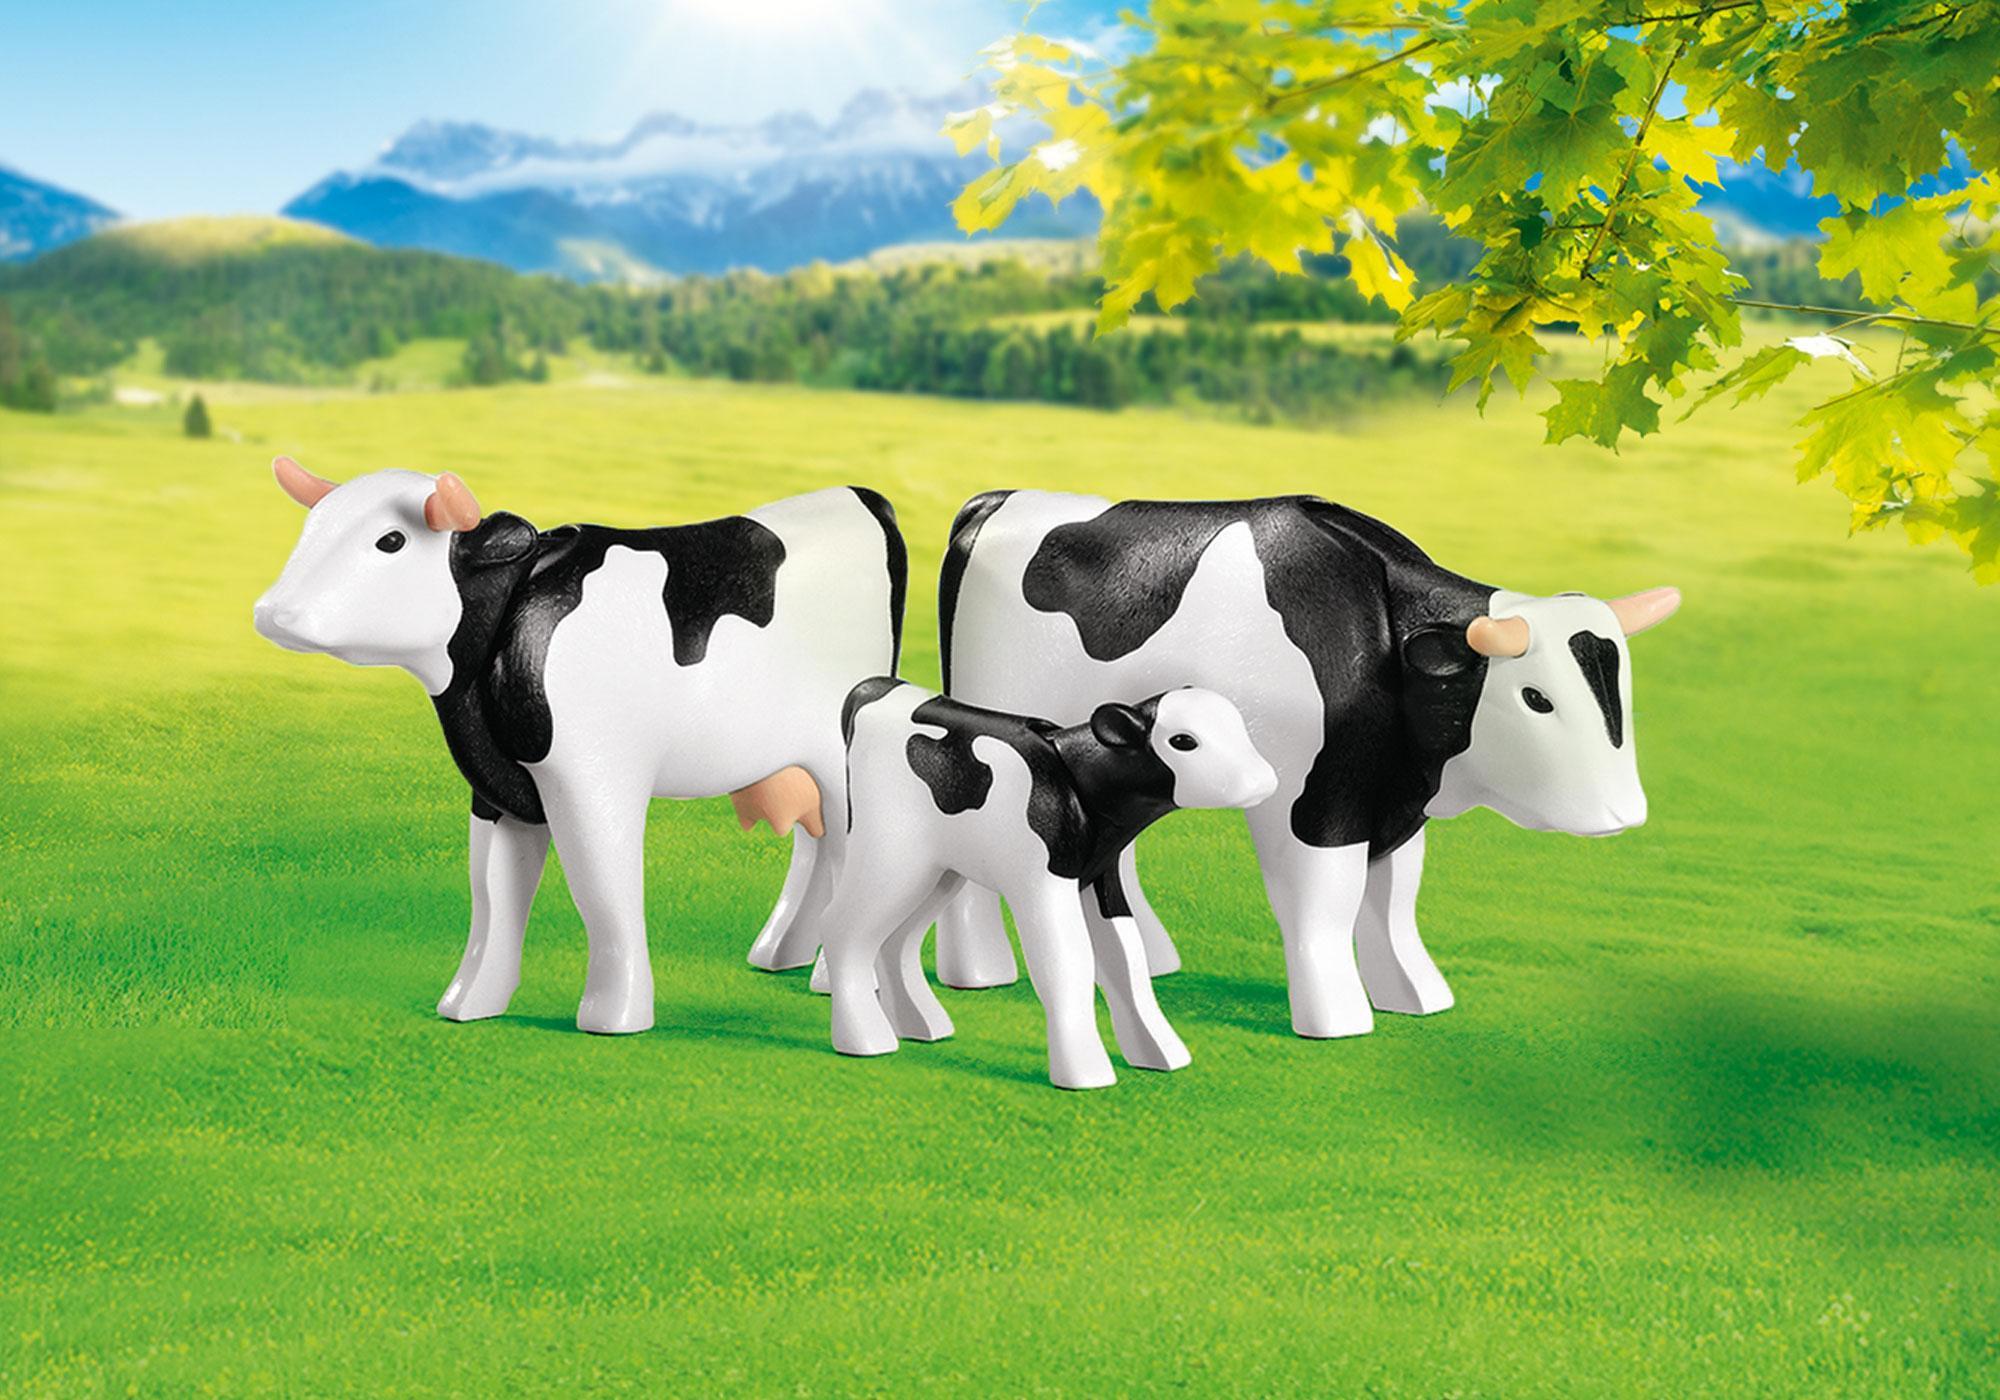 http://media.playmobil.com/i/playmobil/7892_product_detail/2 Black Cows with Calf